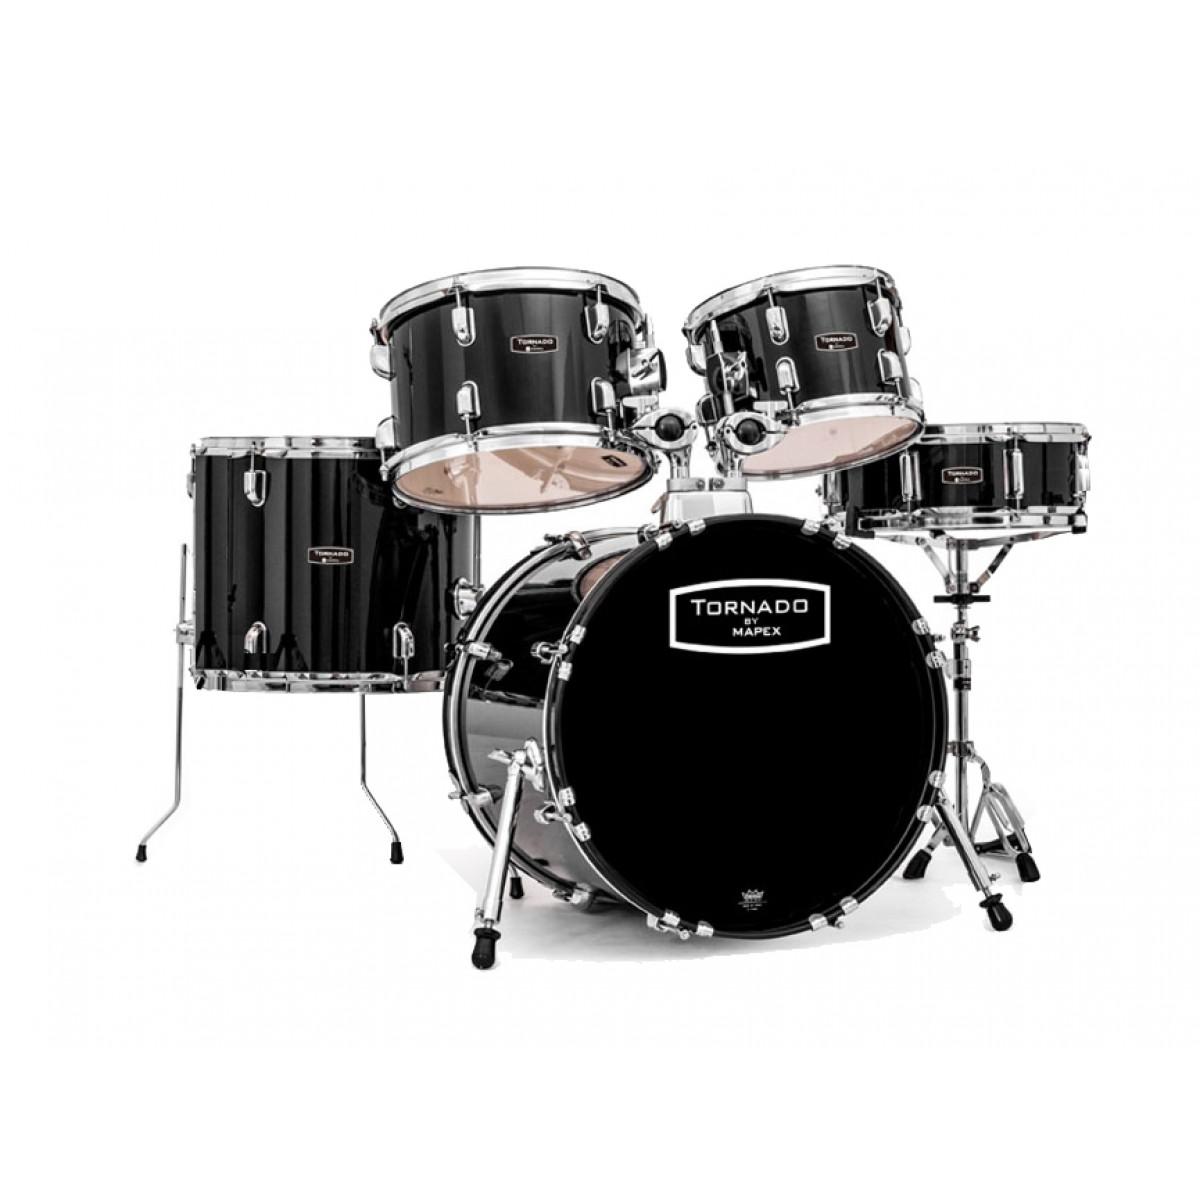 Tornado By Mapex Tnd5844ft Drum Set Drums 1